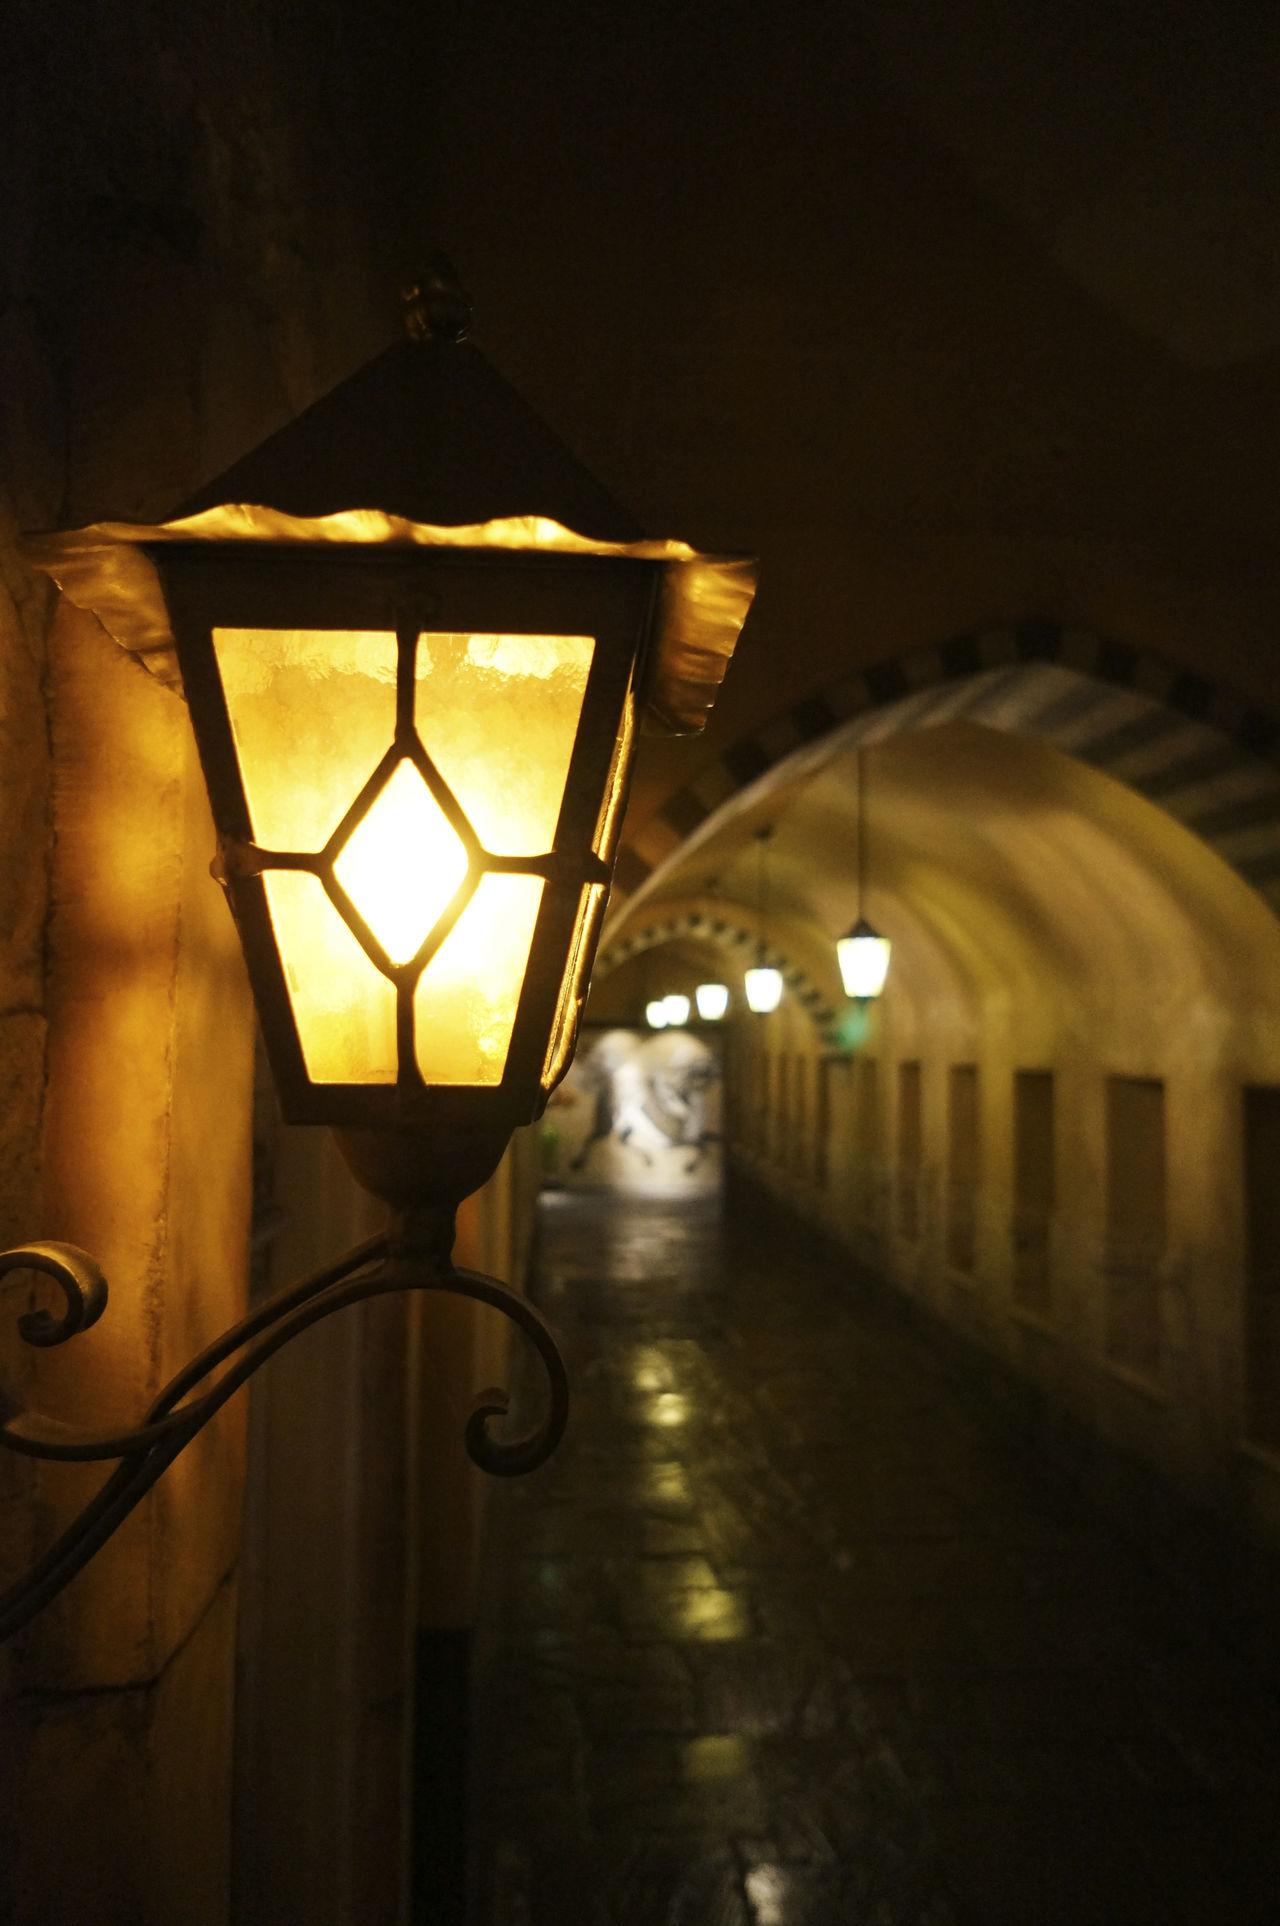 2012 Electricity  Lamp Light Light And Shadow Lighting Equipment Night Street Light Tunnel Wall Lamp トンネル ランプ 夜